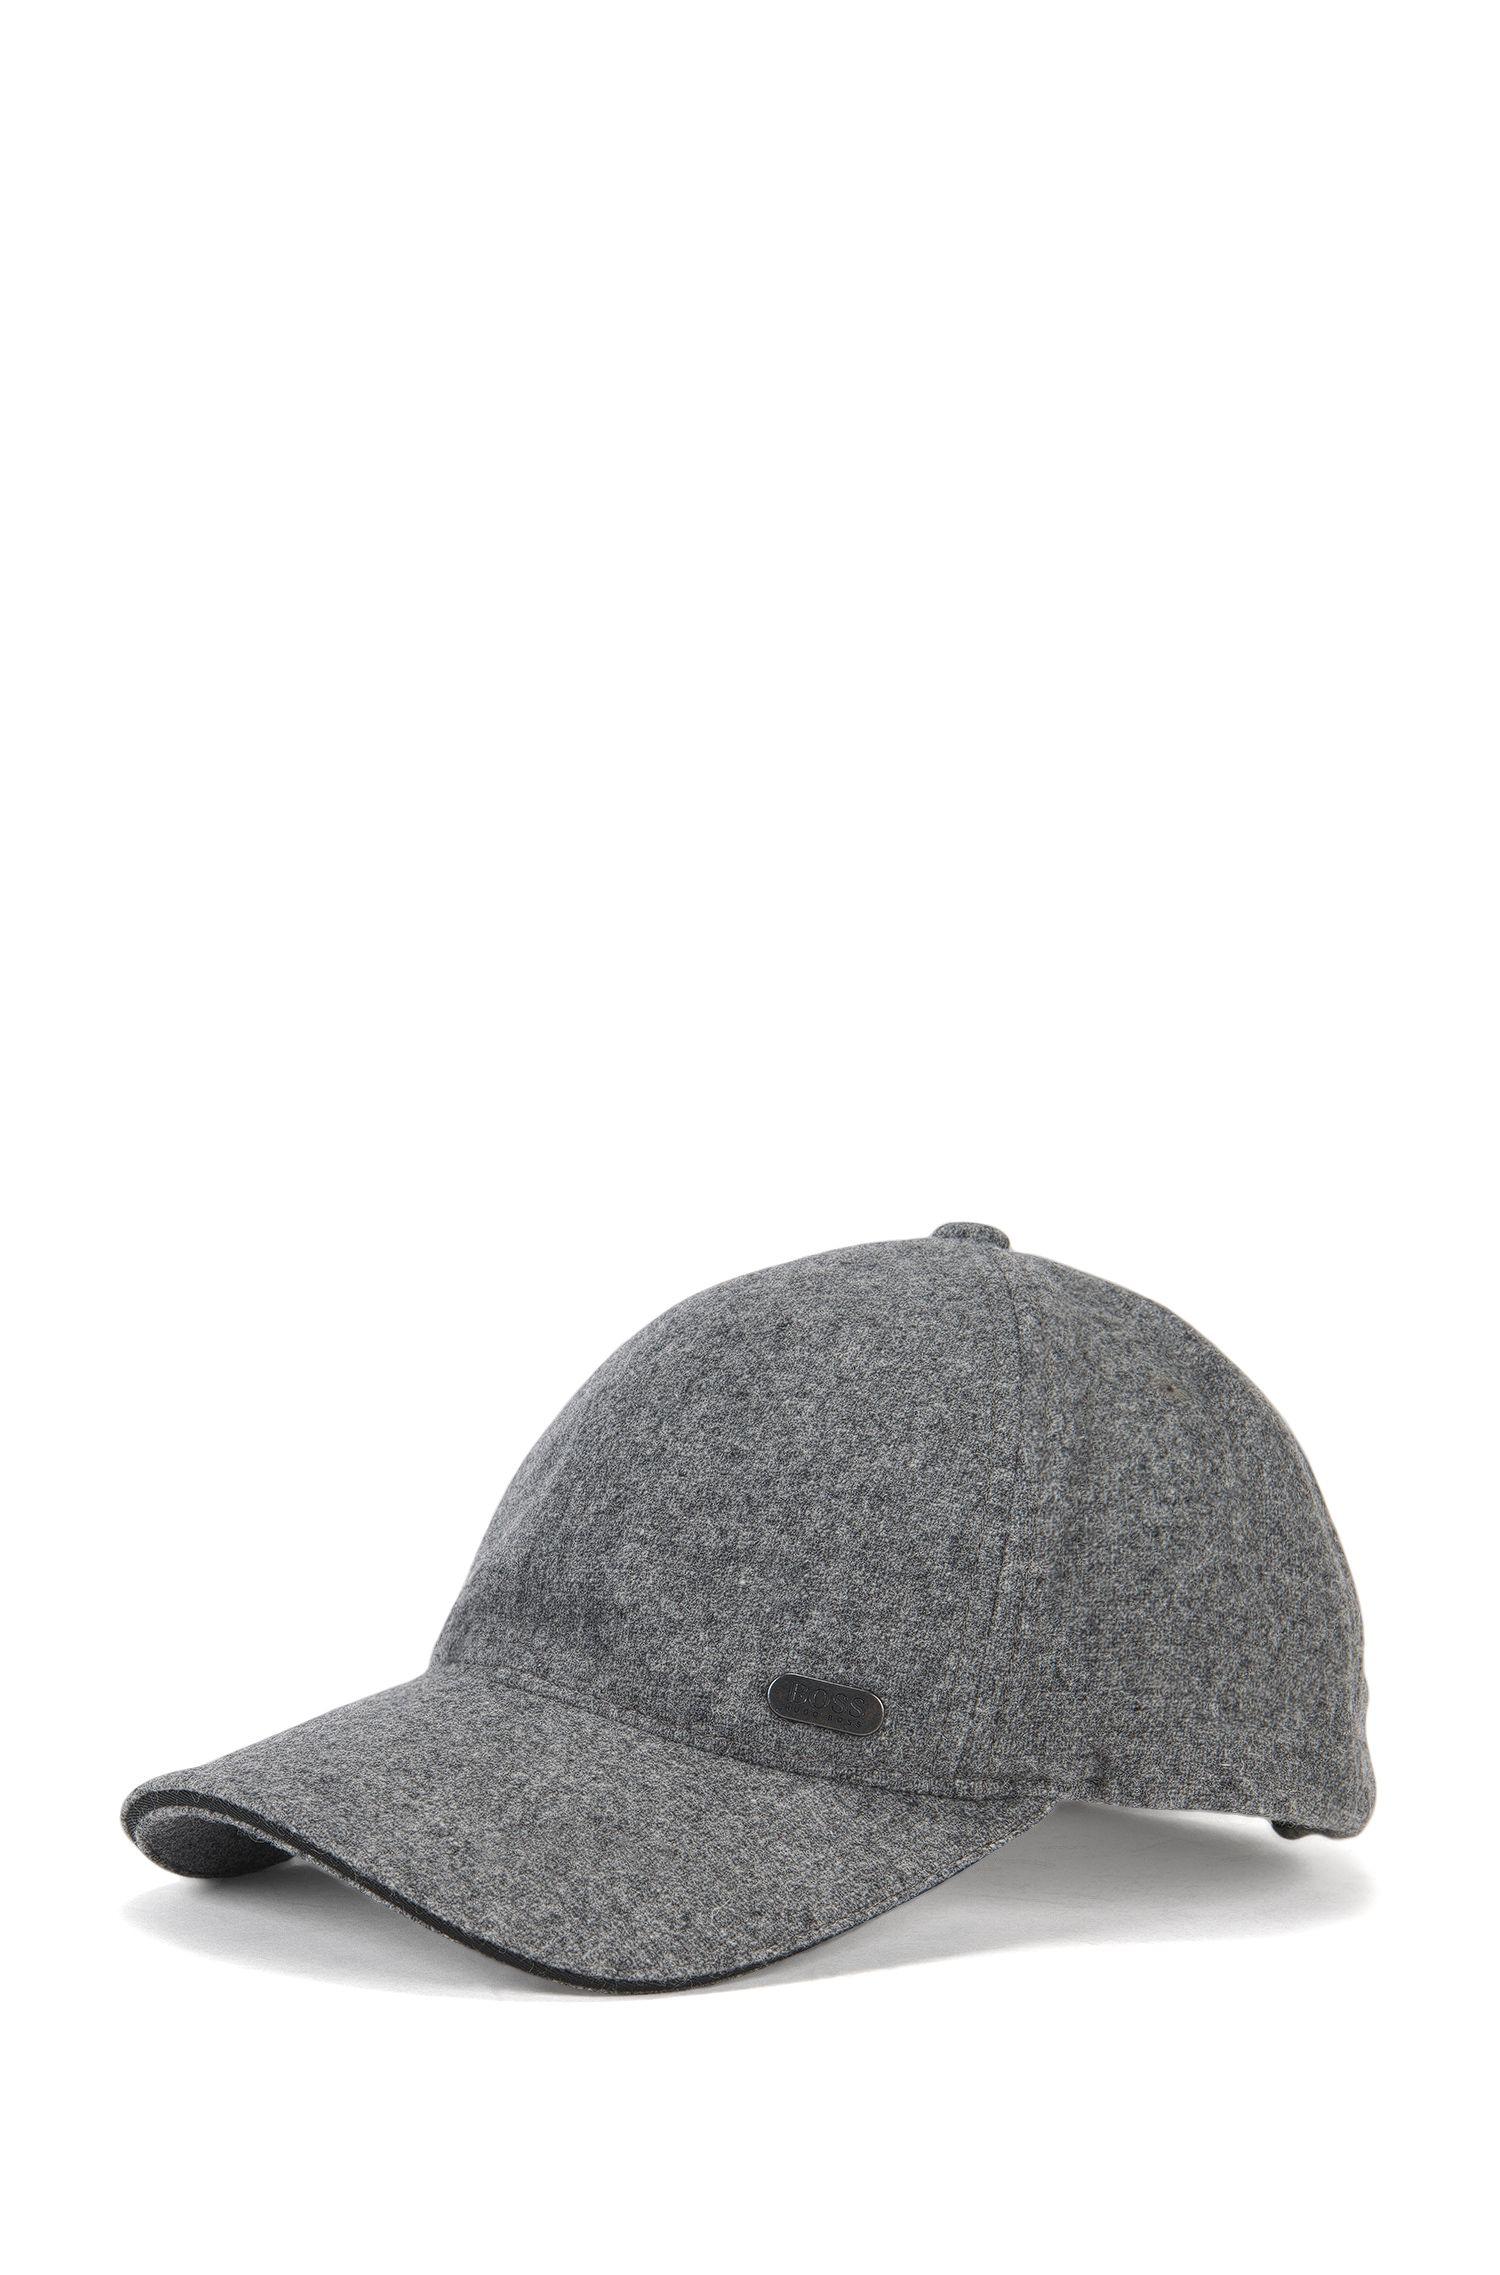 Baseball Cap aus elastischem Woll-Mix